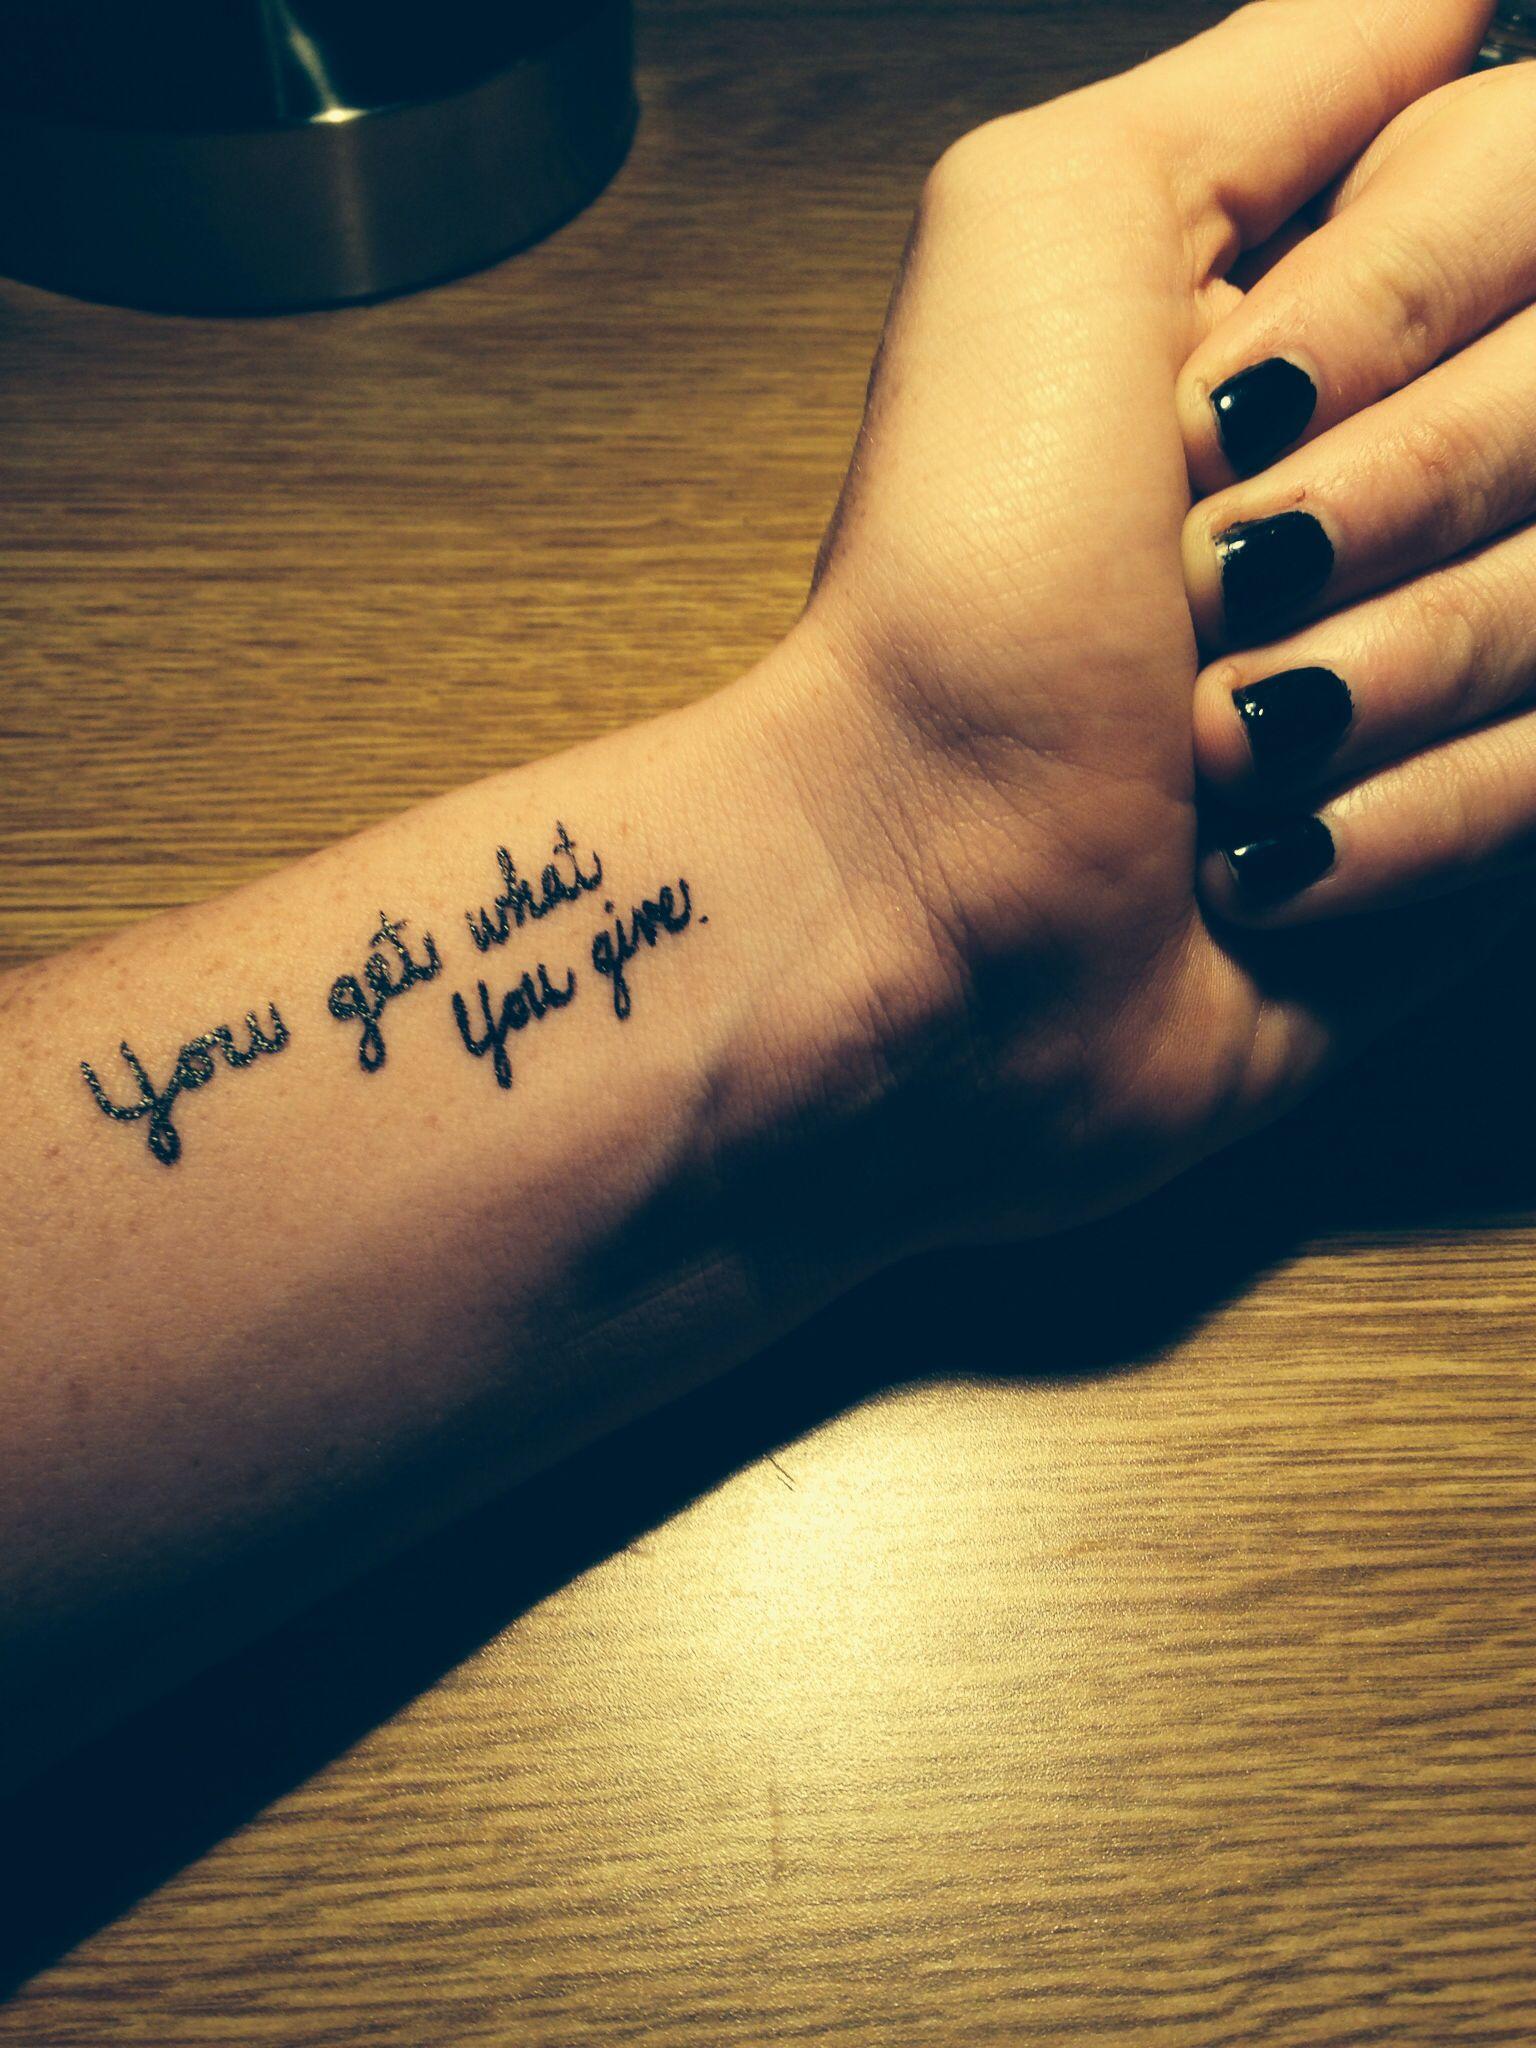 Wrist tattoo cute tattoo quote tattoo you get what you